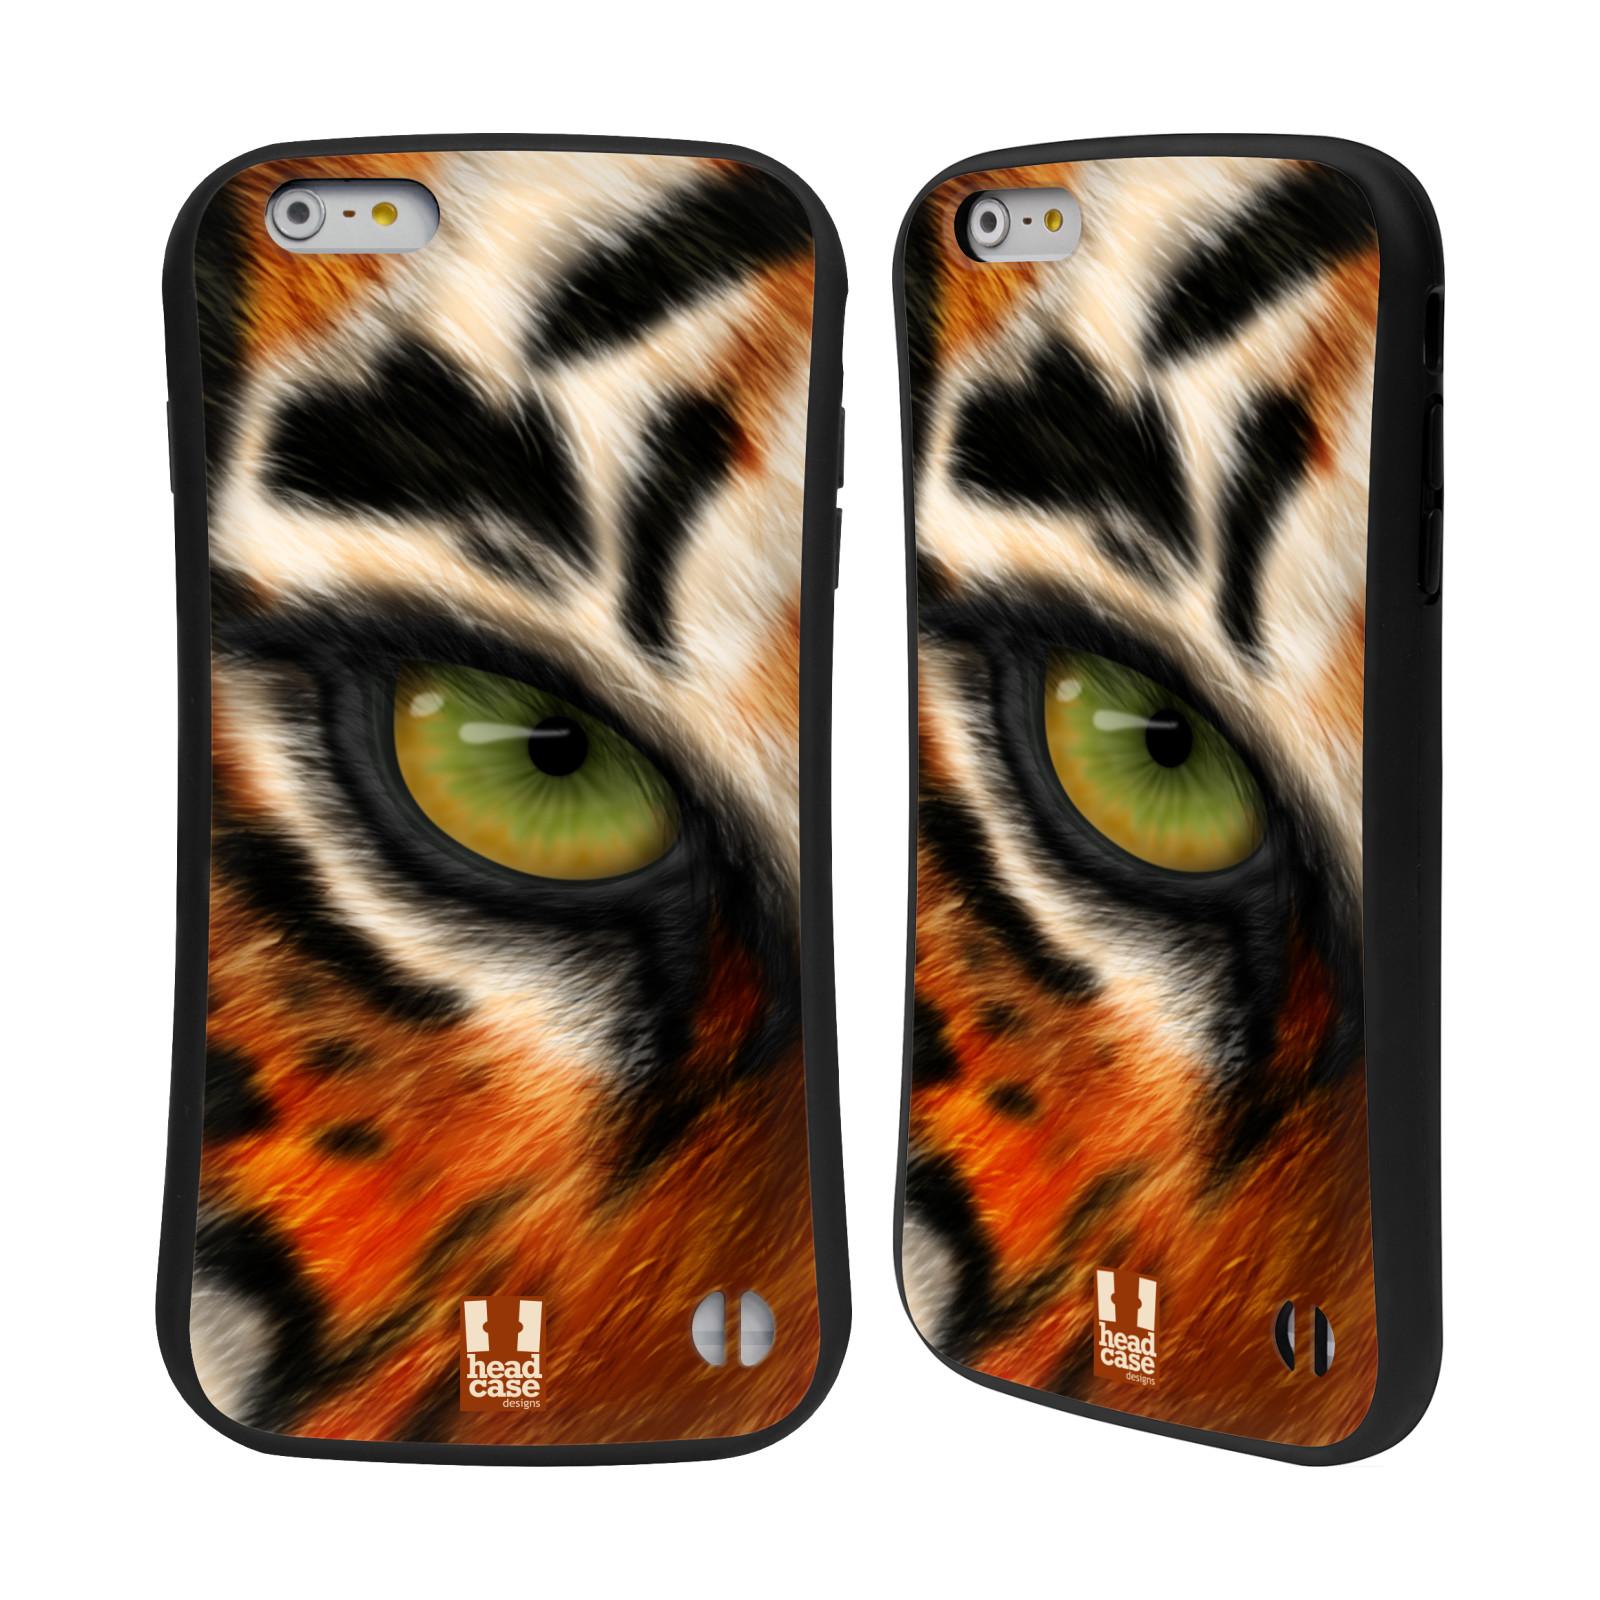 HEAD CASE silikon/plast odolný obal na mobil Apple Iphone 6 PLUS / 6S PLUS vzor pohled zvířete oko tygr